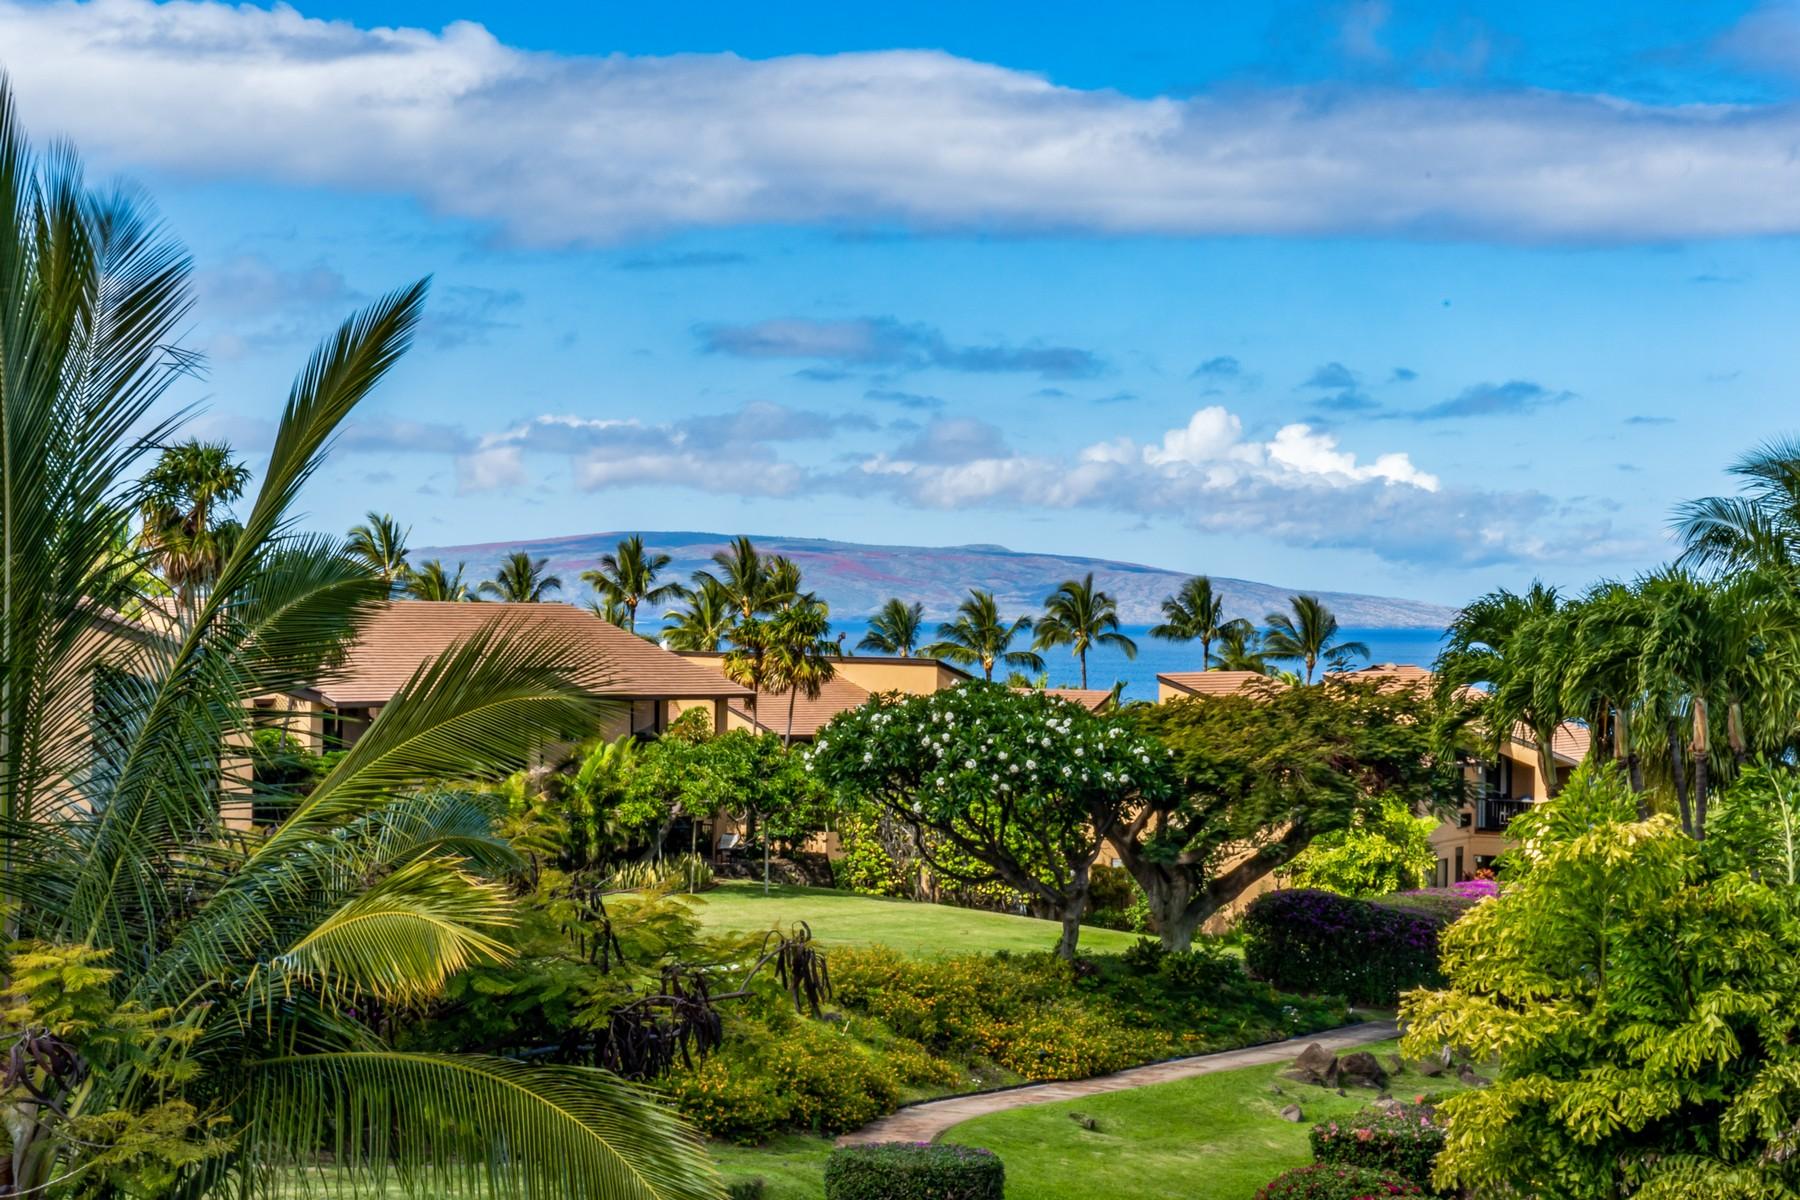 Condominiums 為 出售 在 Exceptional Value in Wailea 3300 Wailea Alanui Dr - Wailea Ekahi 26A, Wailea, 夏威夷 96753 美國